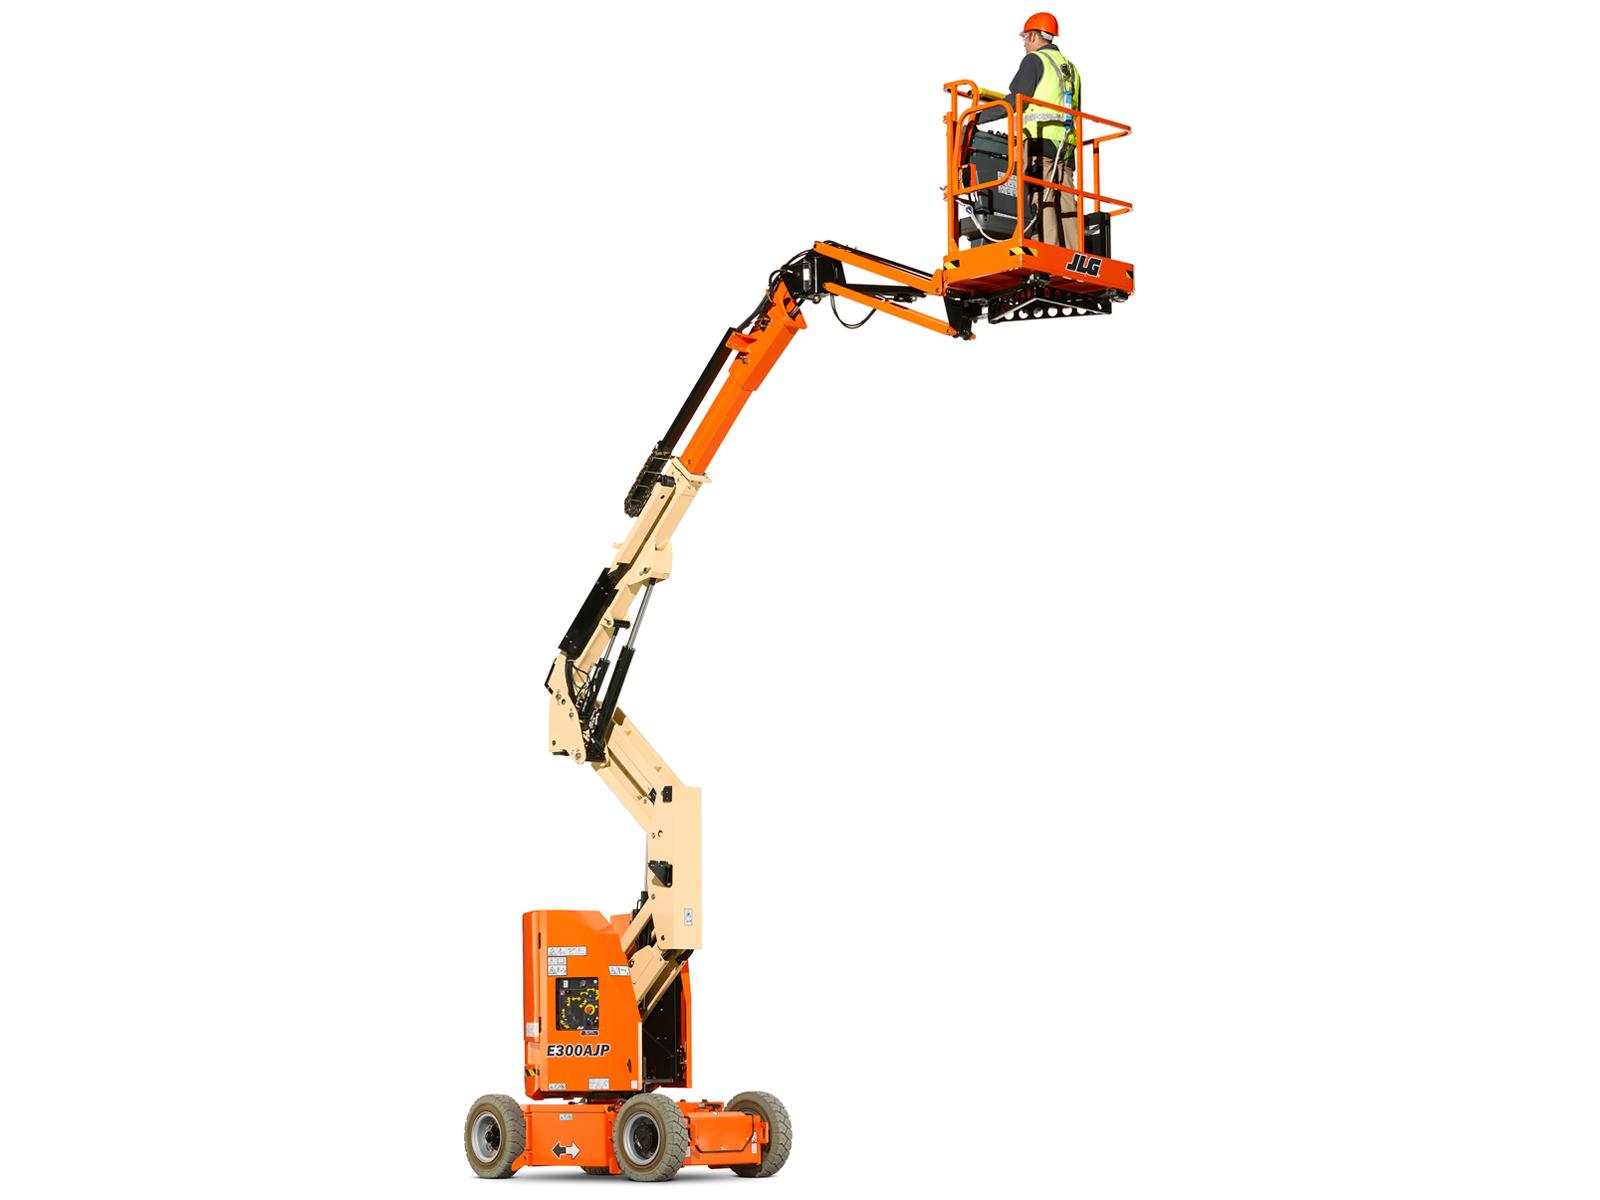 e300ajp electric boom lift jlg previous model next model